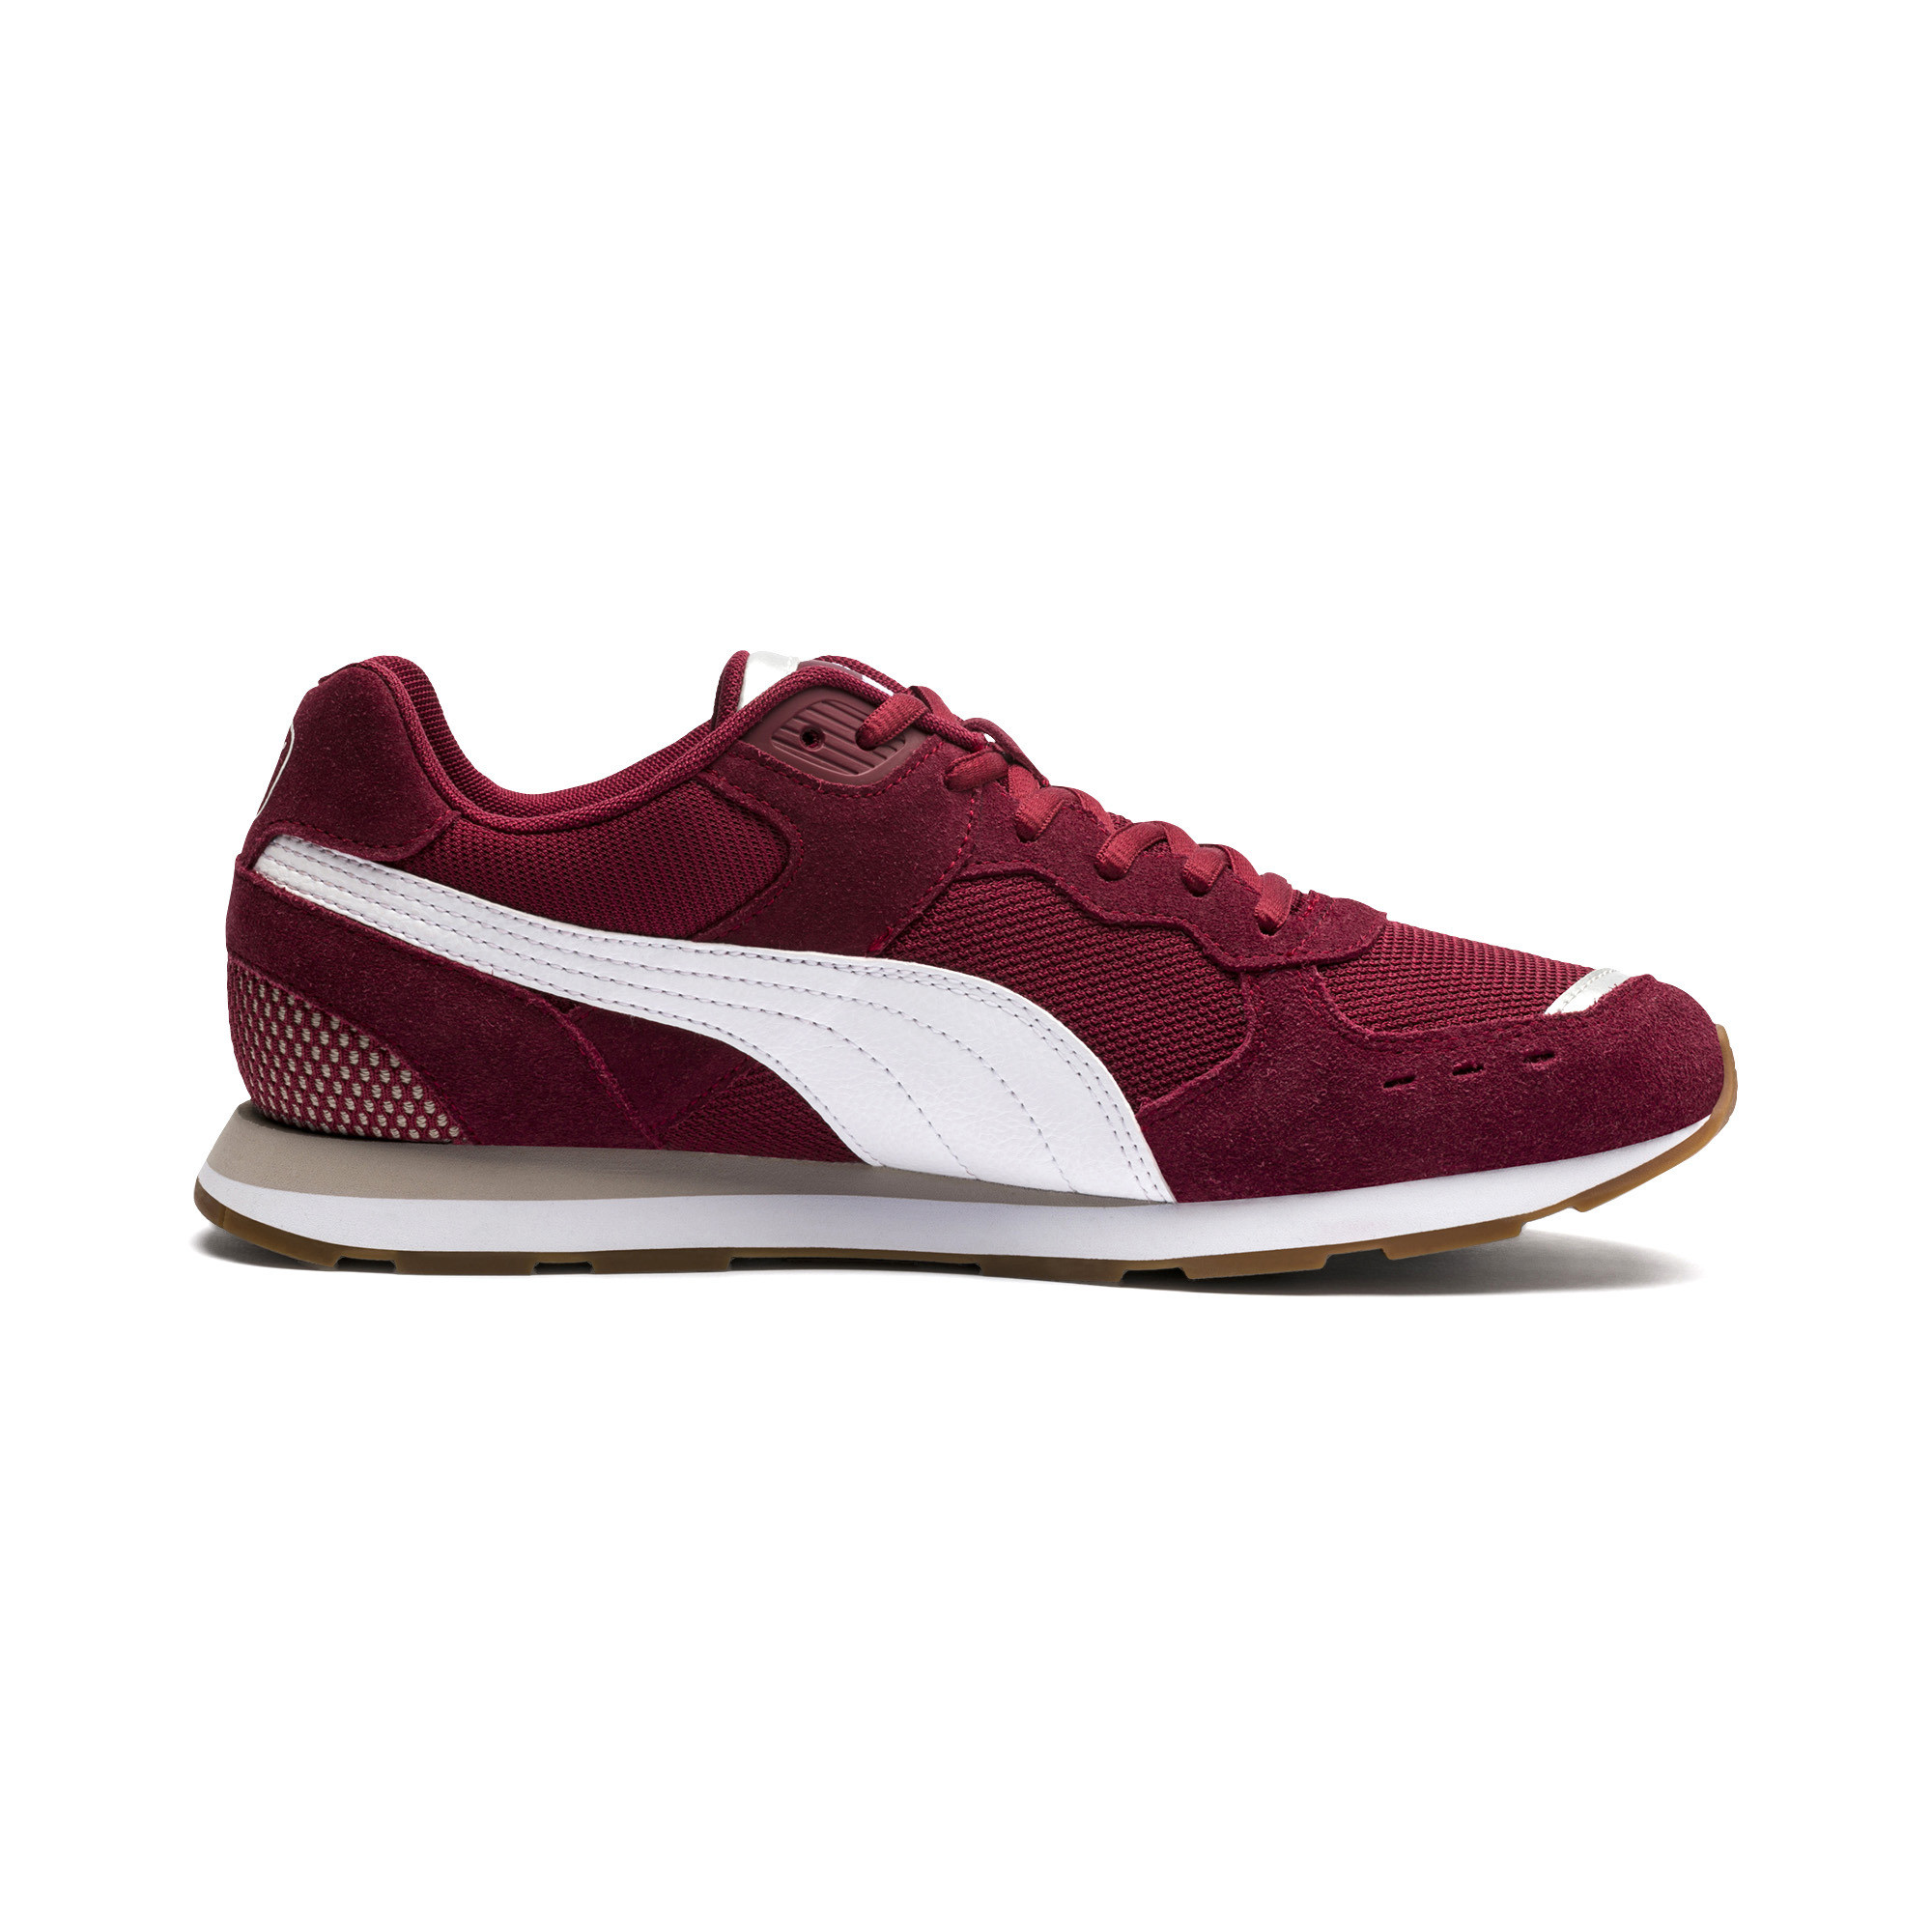 Image Puma Vista Sneakers #5